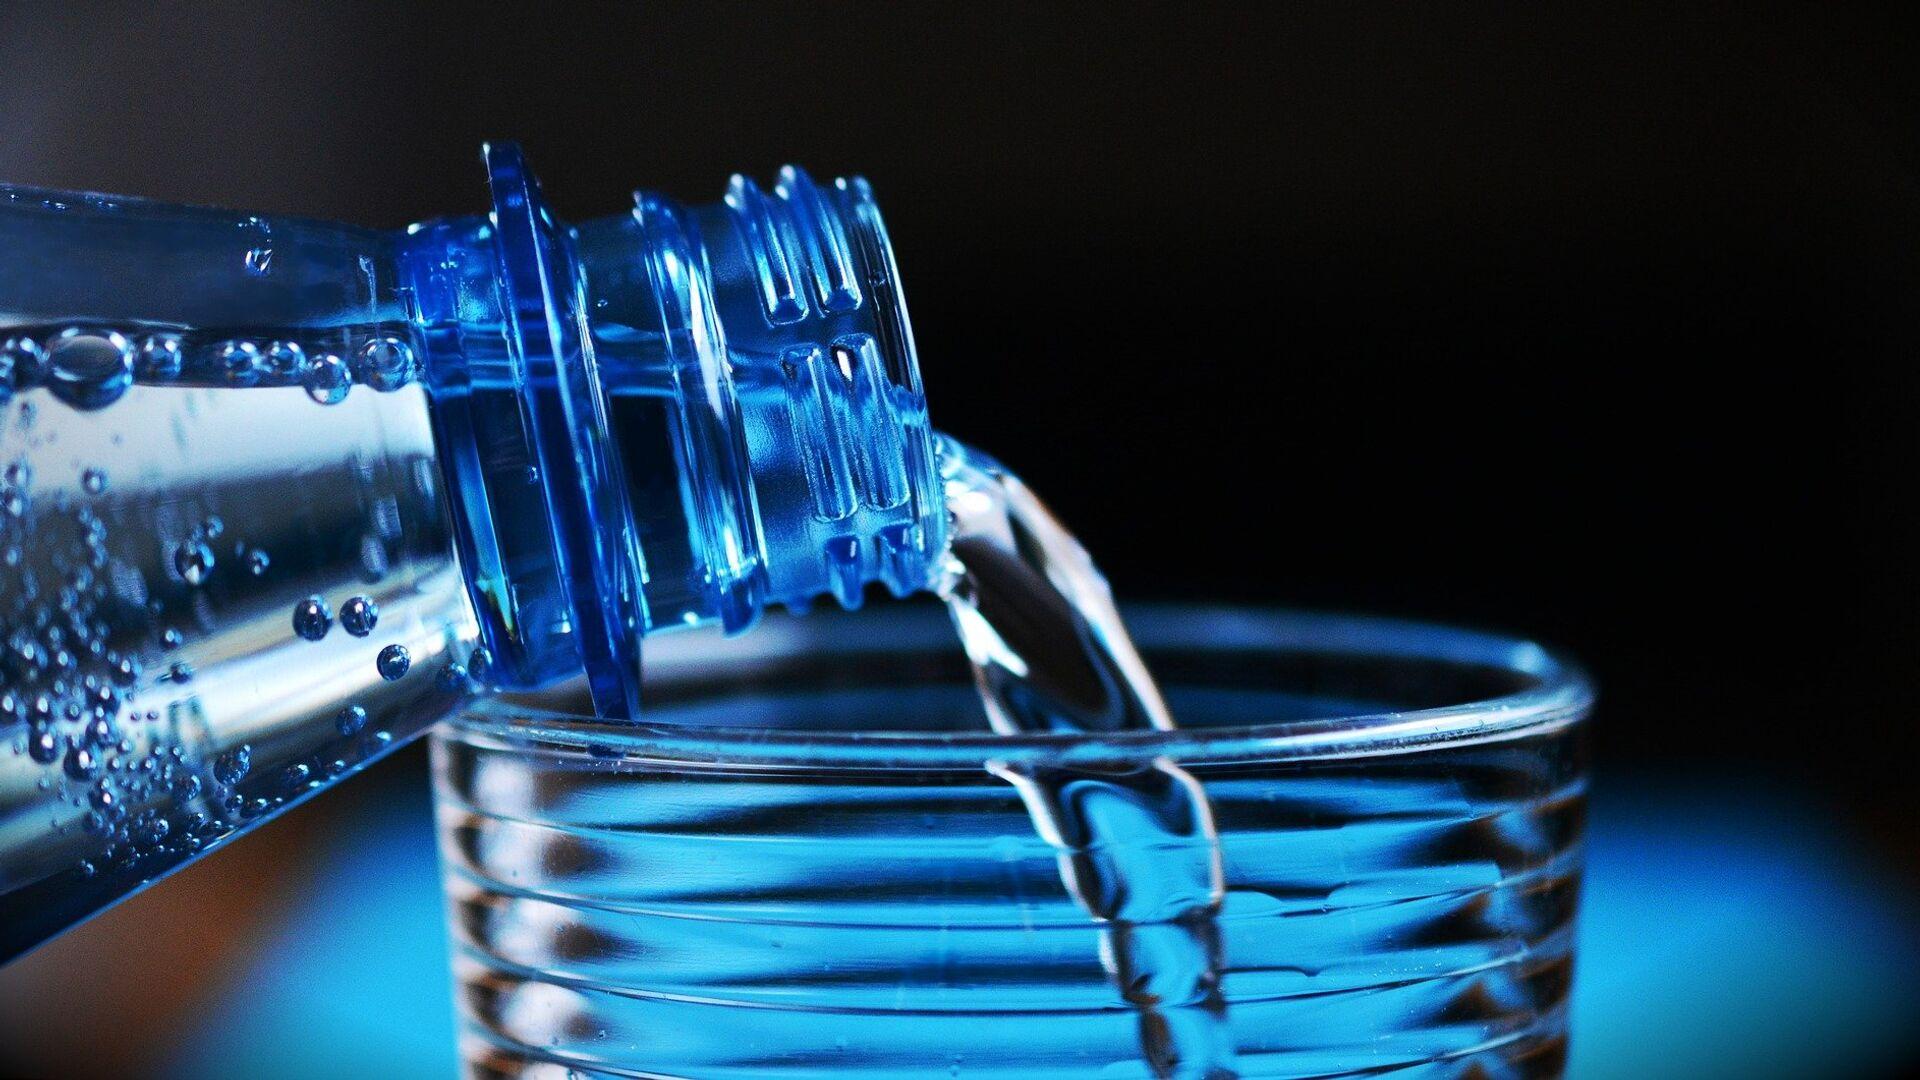 Botella de agua (imagen referencial) - Sputnik Mundo, 1920, 26.02.2021